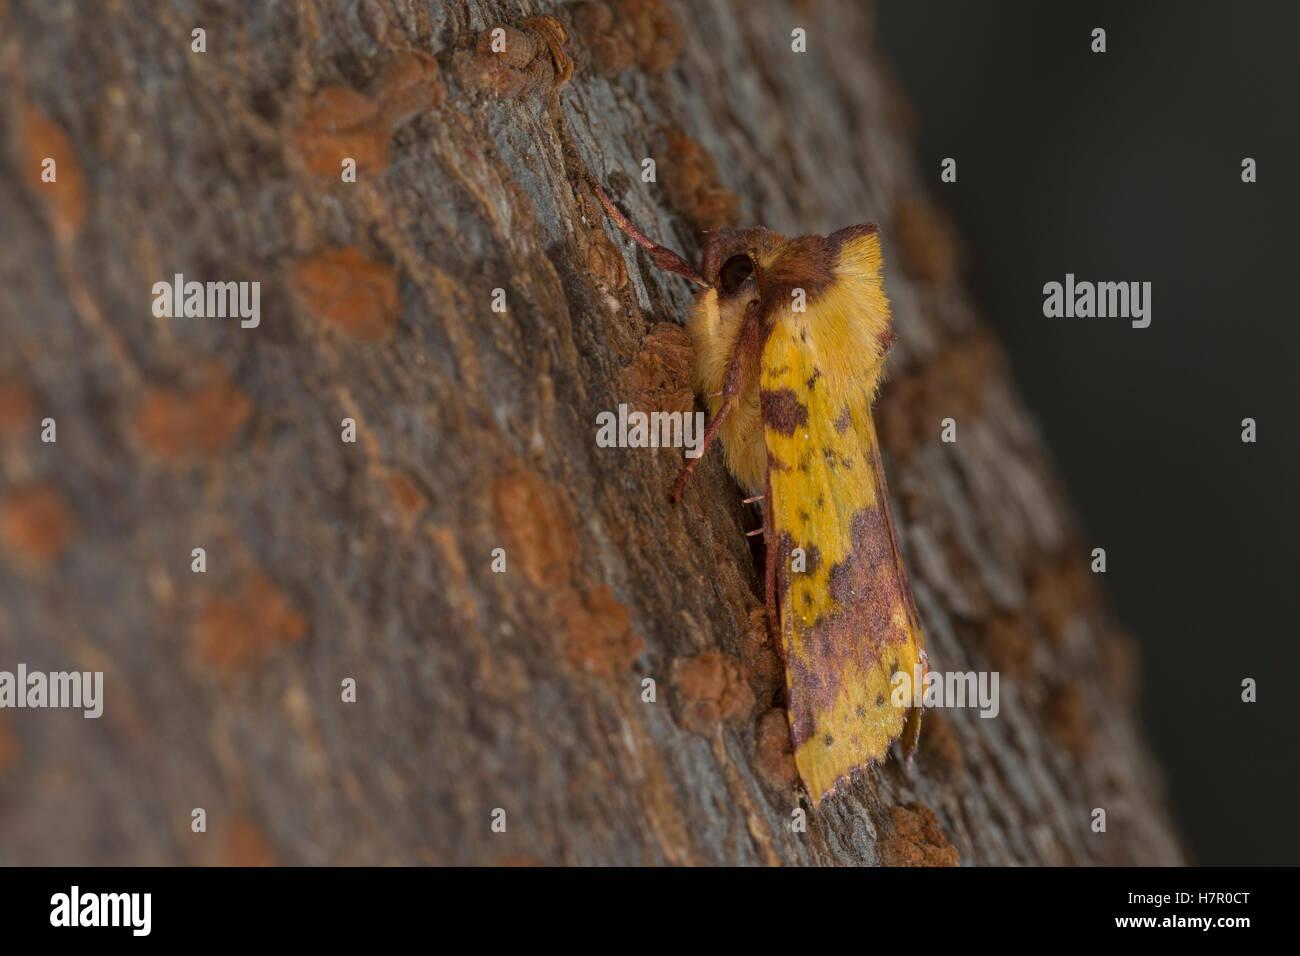 Violett-Gelbeule, Weiden-Gelbeule, Weidengelbeule, Xanthia togata, Pink-barred Sallow. Eulenfalter, Noctuidae, noctuid - Stock Image